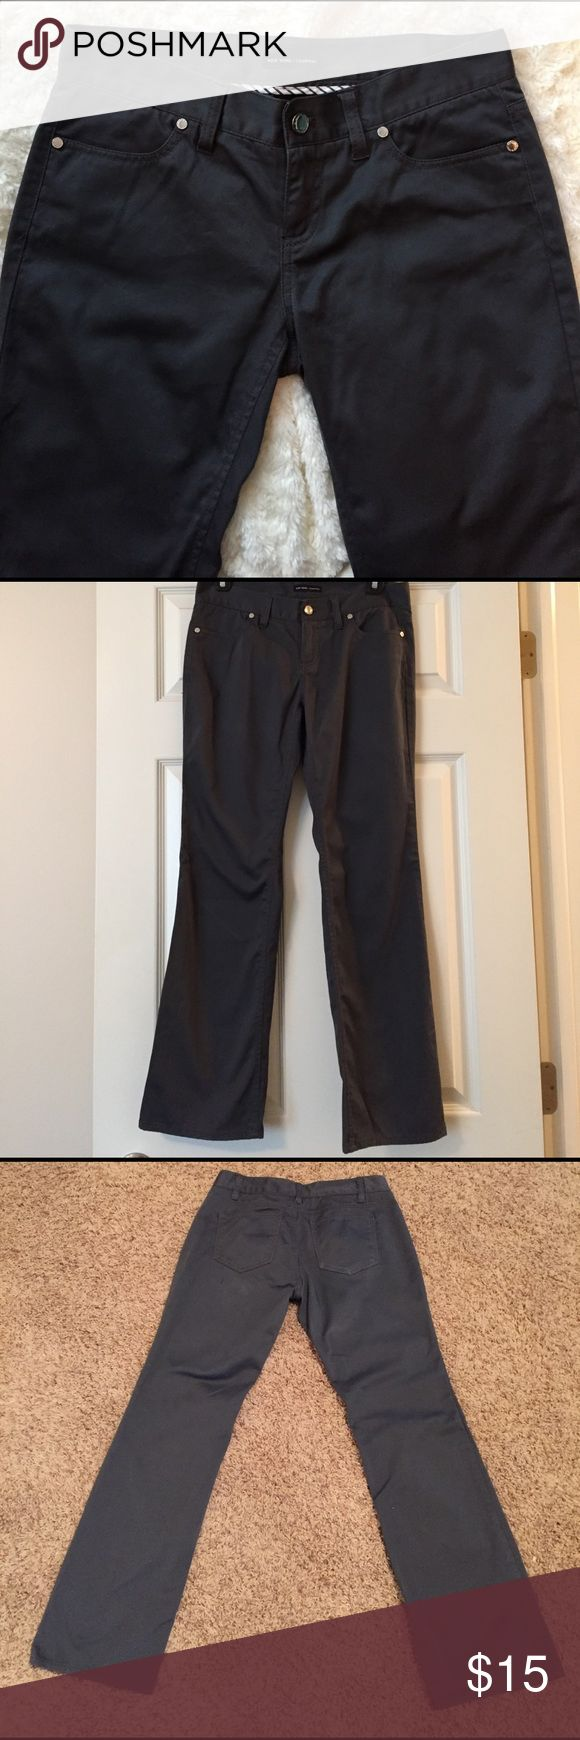 "Charcoal New York & Company Dress Slacks Charcoal New York and Company Dress Slacks. Measures 36"" down one leg. Excellent Condition. New York & Company Pants"